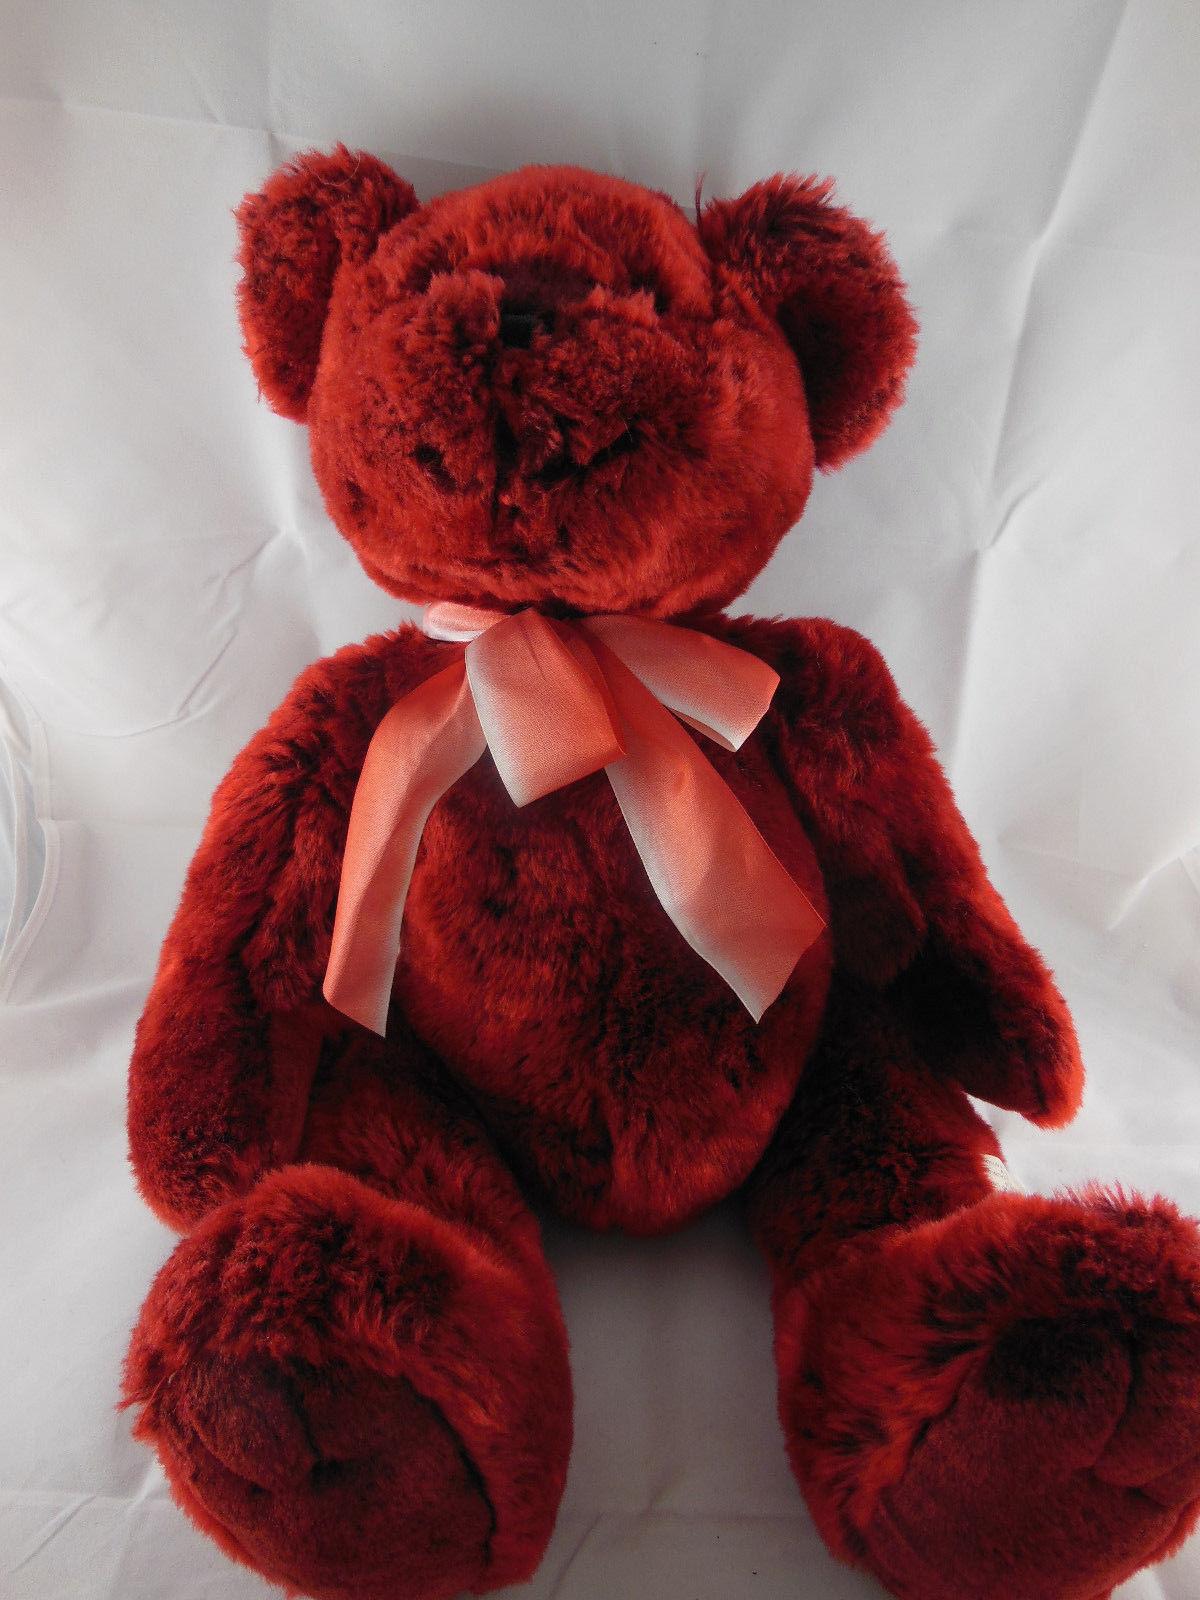 Teddy Bear Stuffed Toy, Unipak Hugs And Kisses Red Kordy Bear